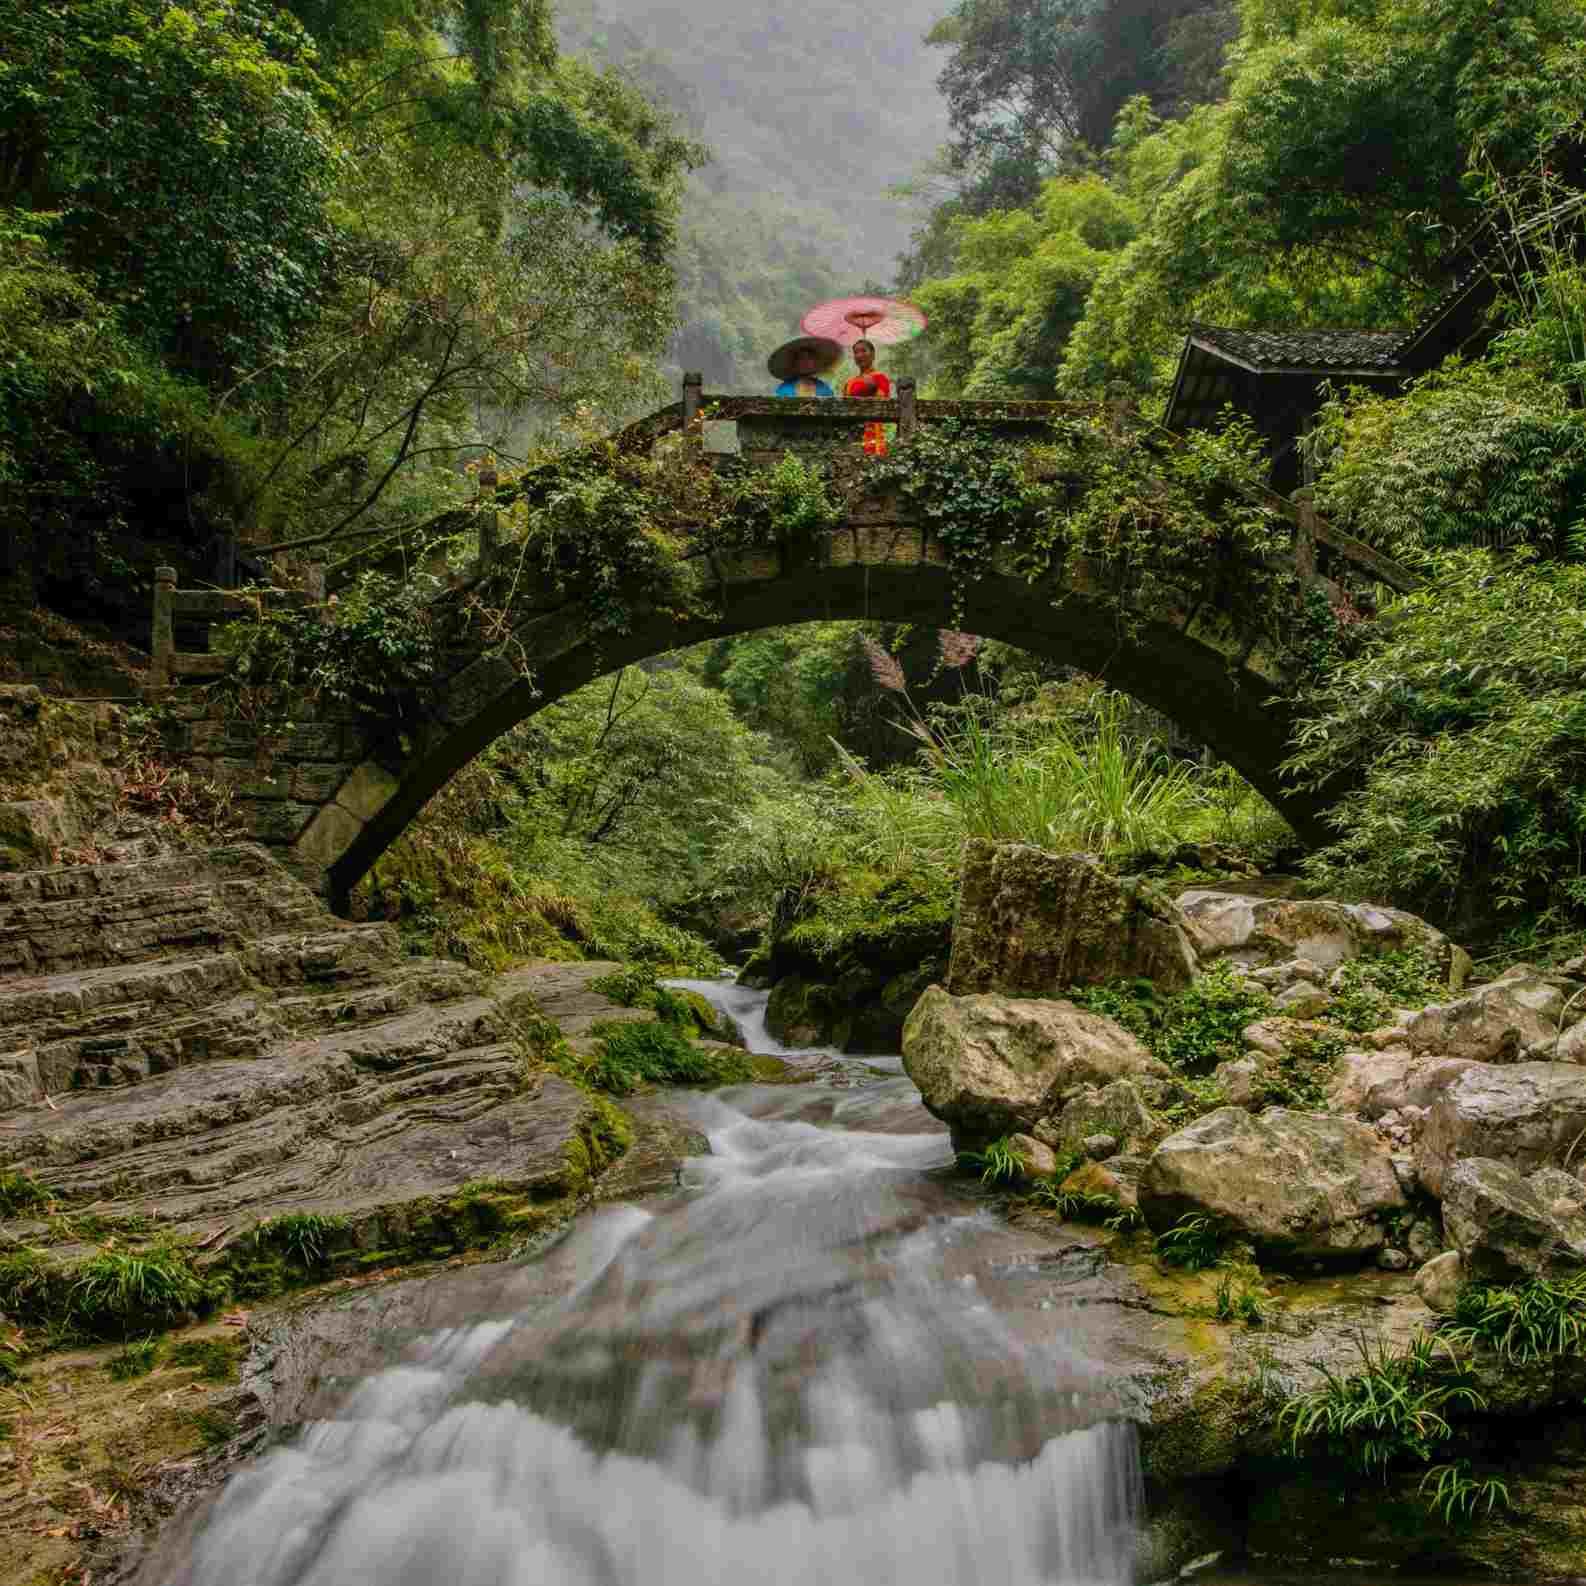 Bridge over the Yangtze River in China